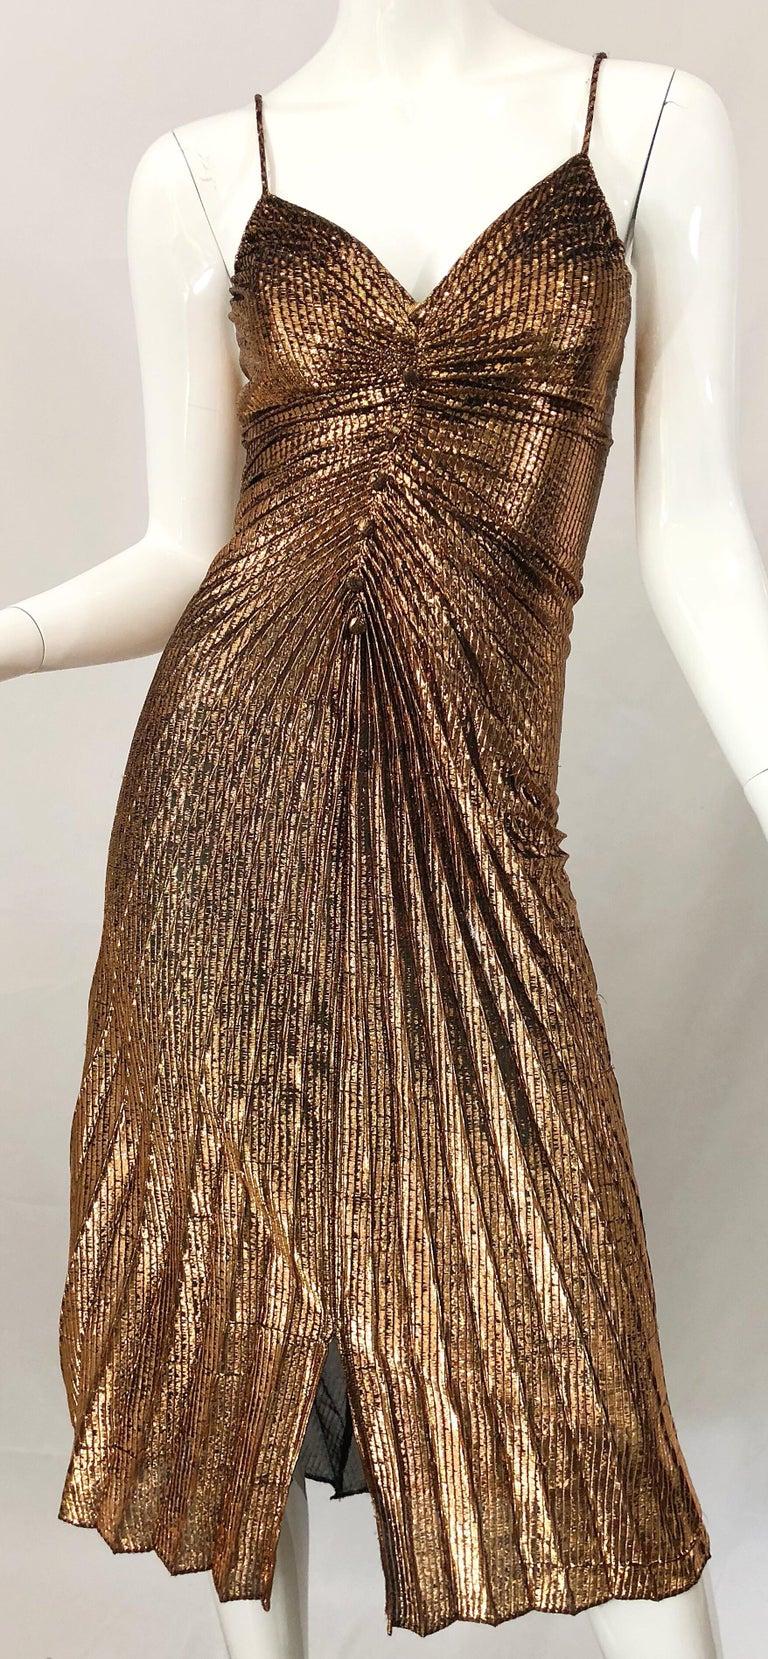 1970s Samir Sexy Golden Bronze Pleated Disco Studio 54 Slinky Vintage 70s Dress For Sale 3